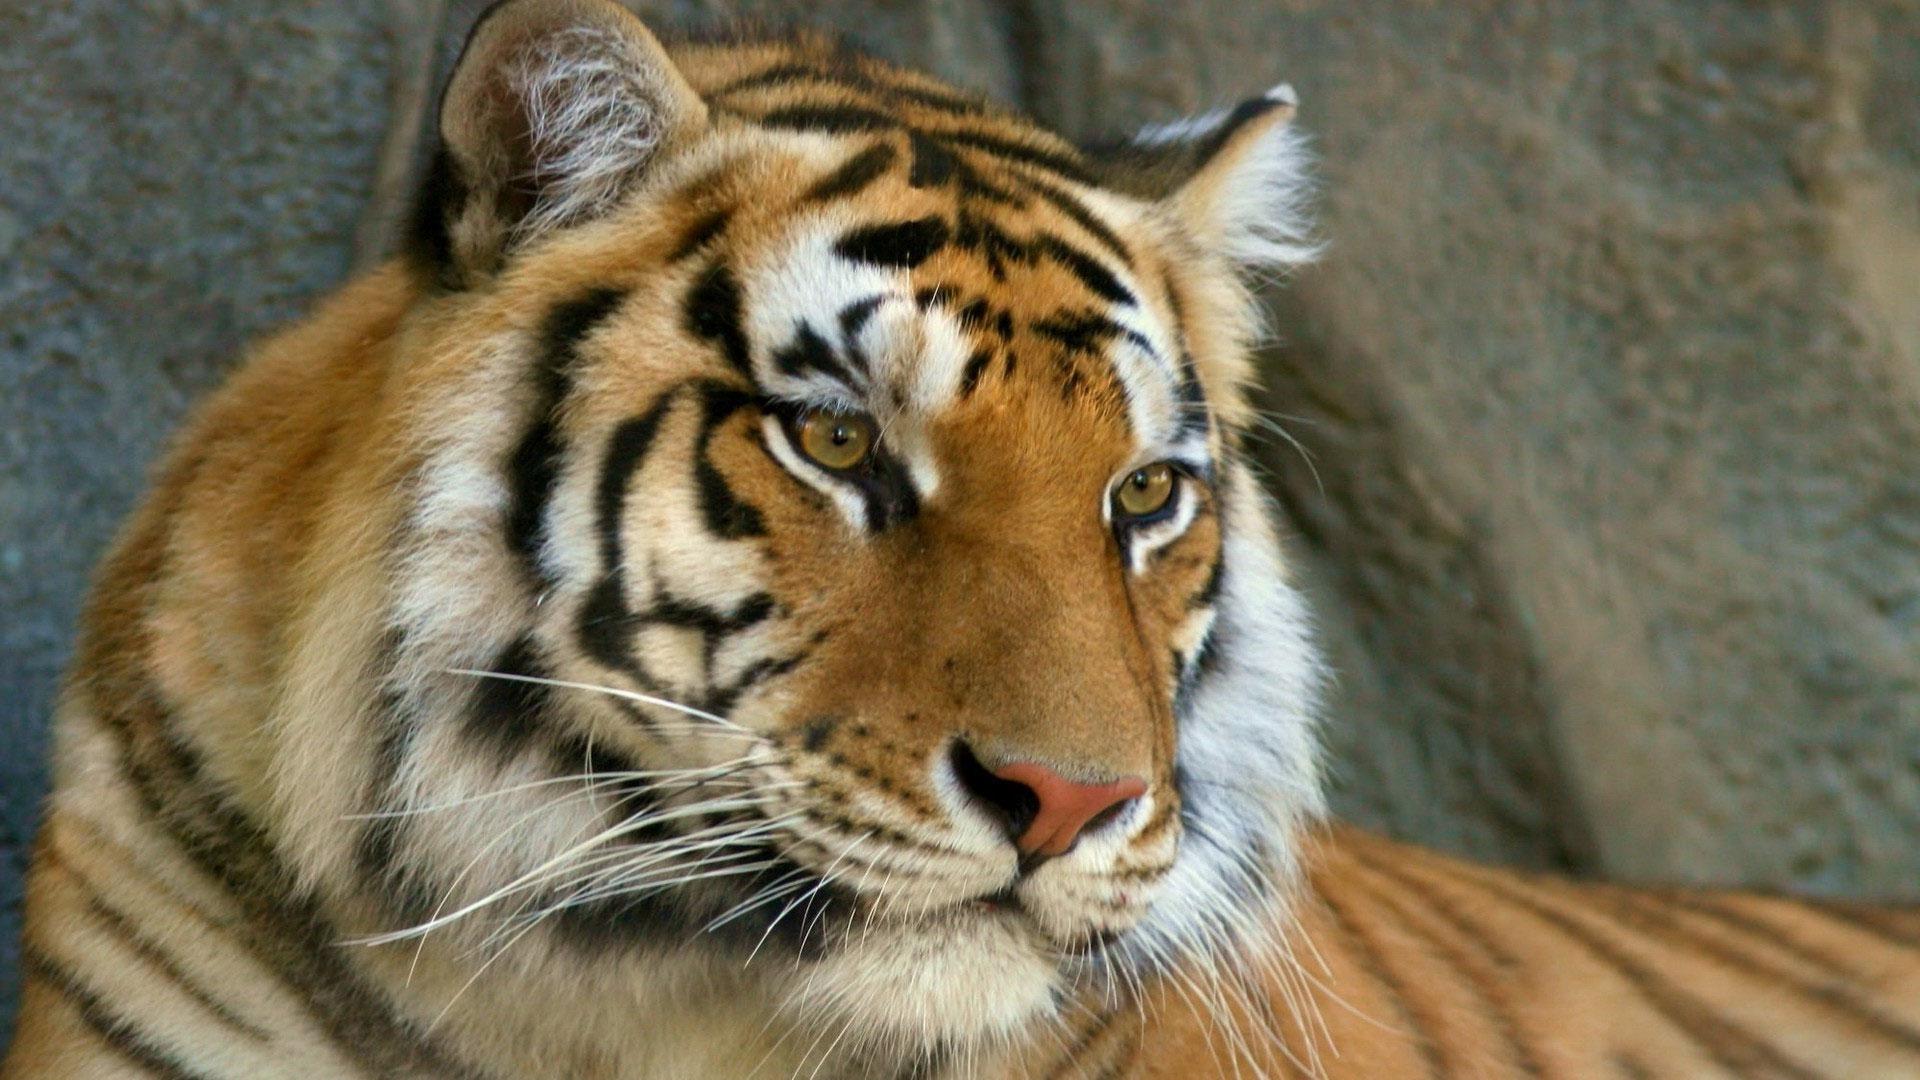 Tiger Face HD Wallpaper Download For Laptop amp Mobile